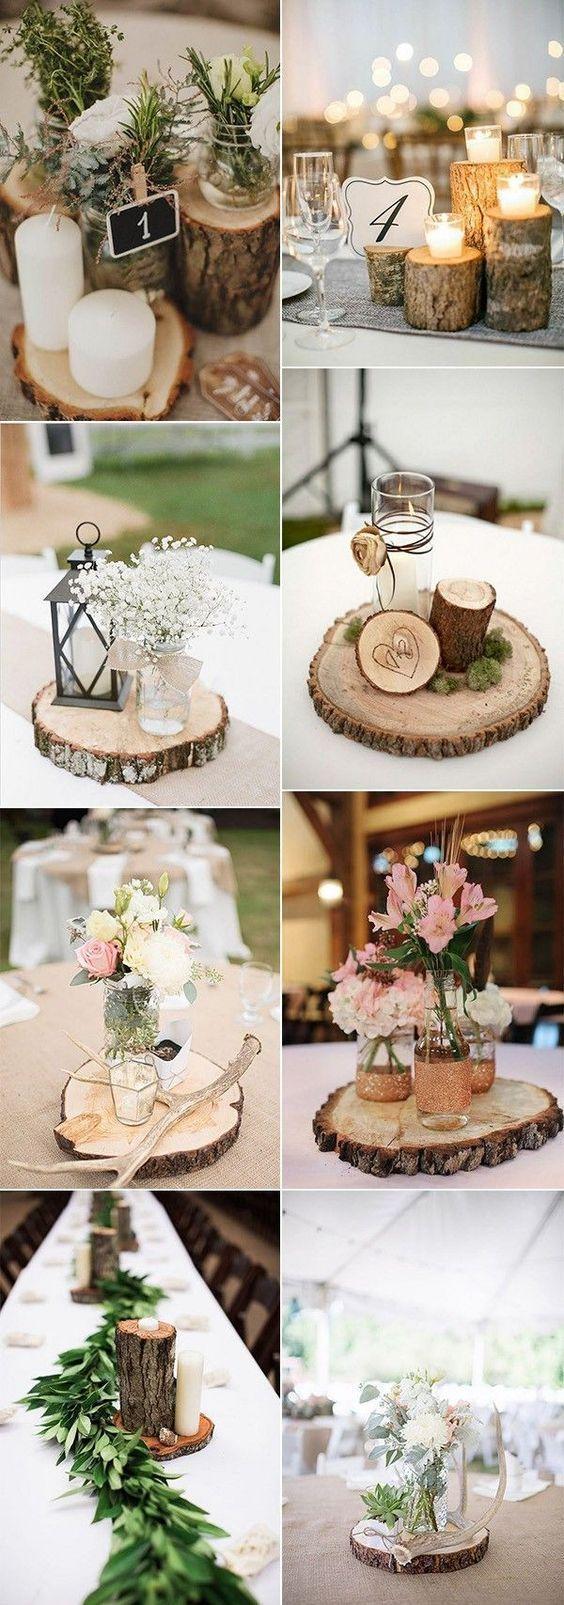 rustic wedding centerpiece ideas with tree stumps #wedding ideas #wedding … #…